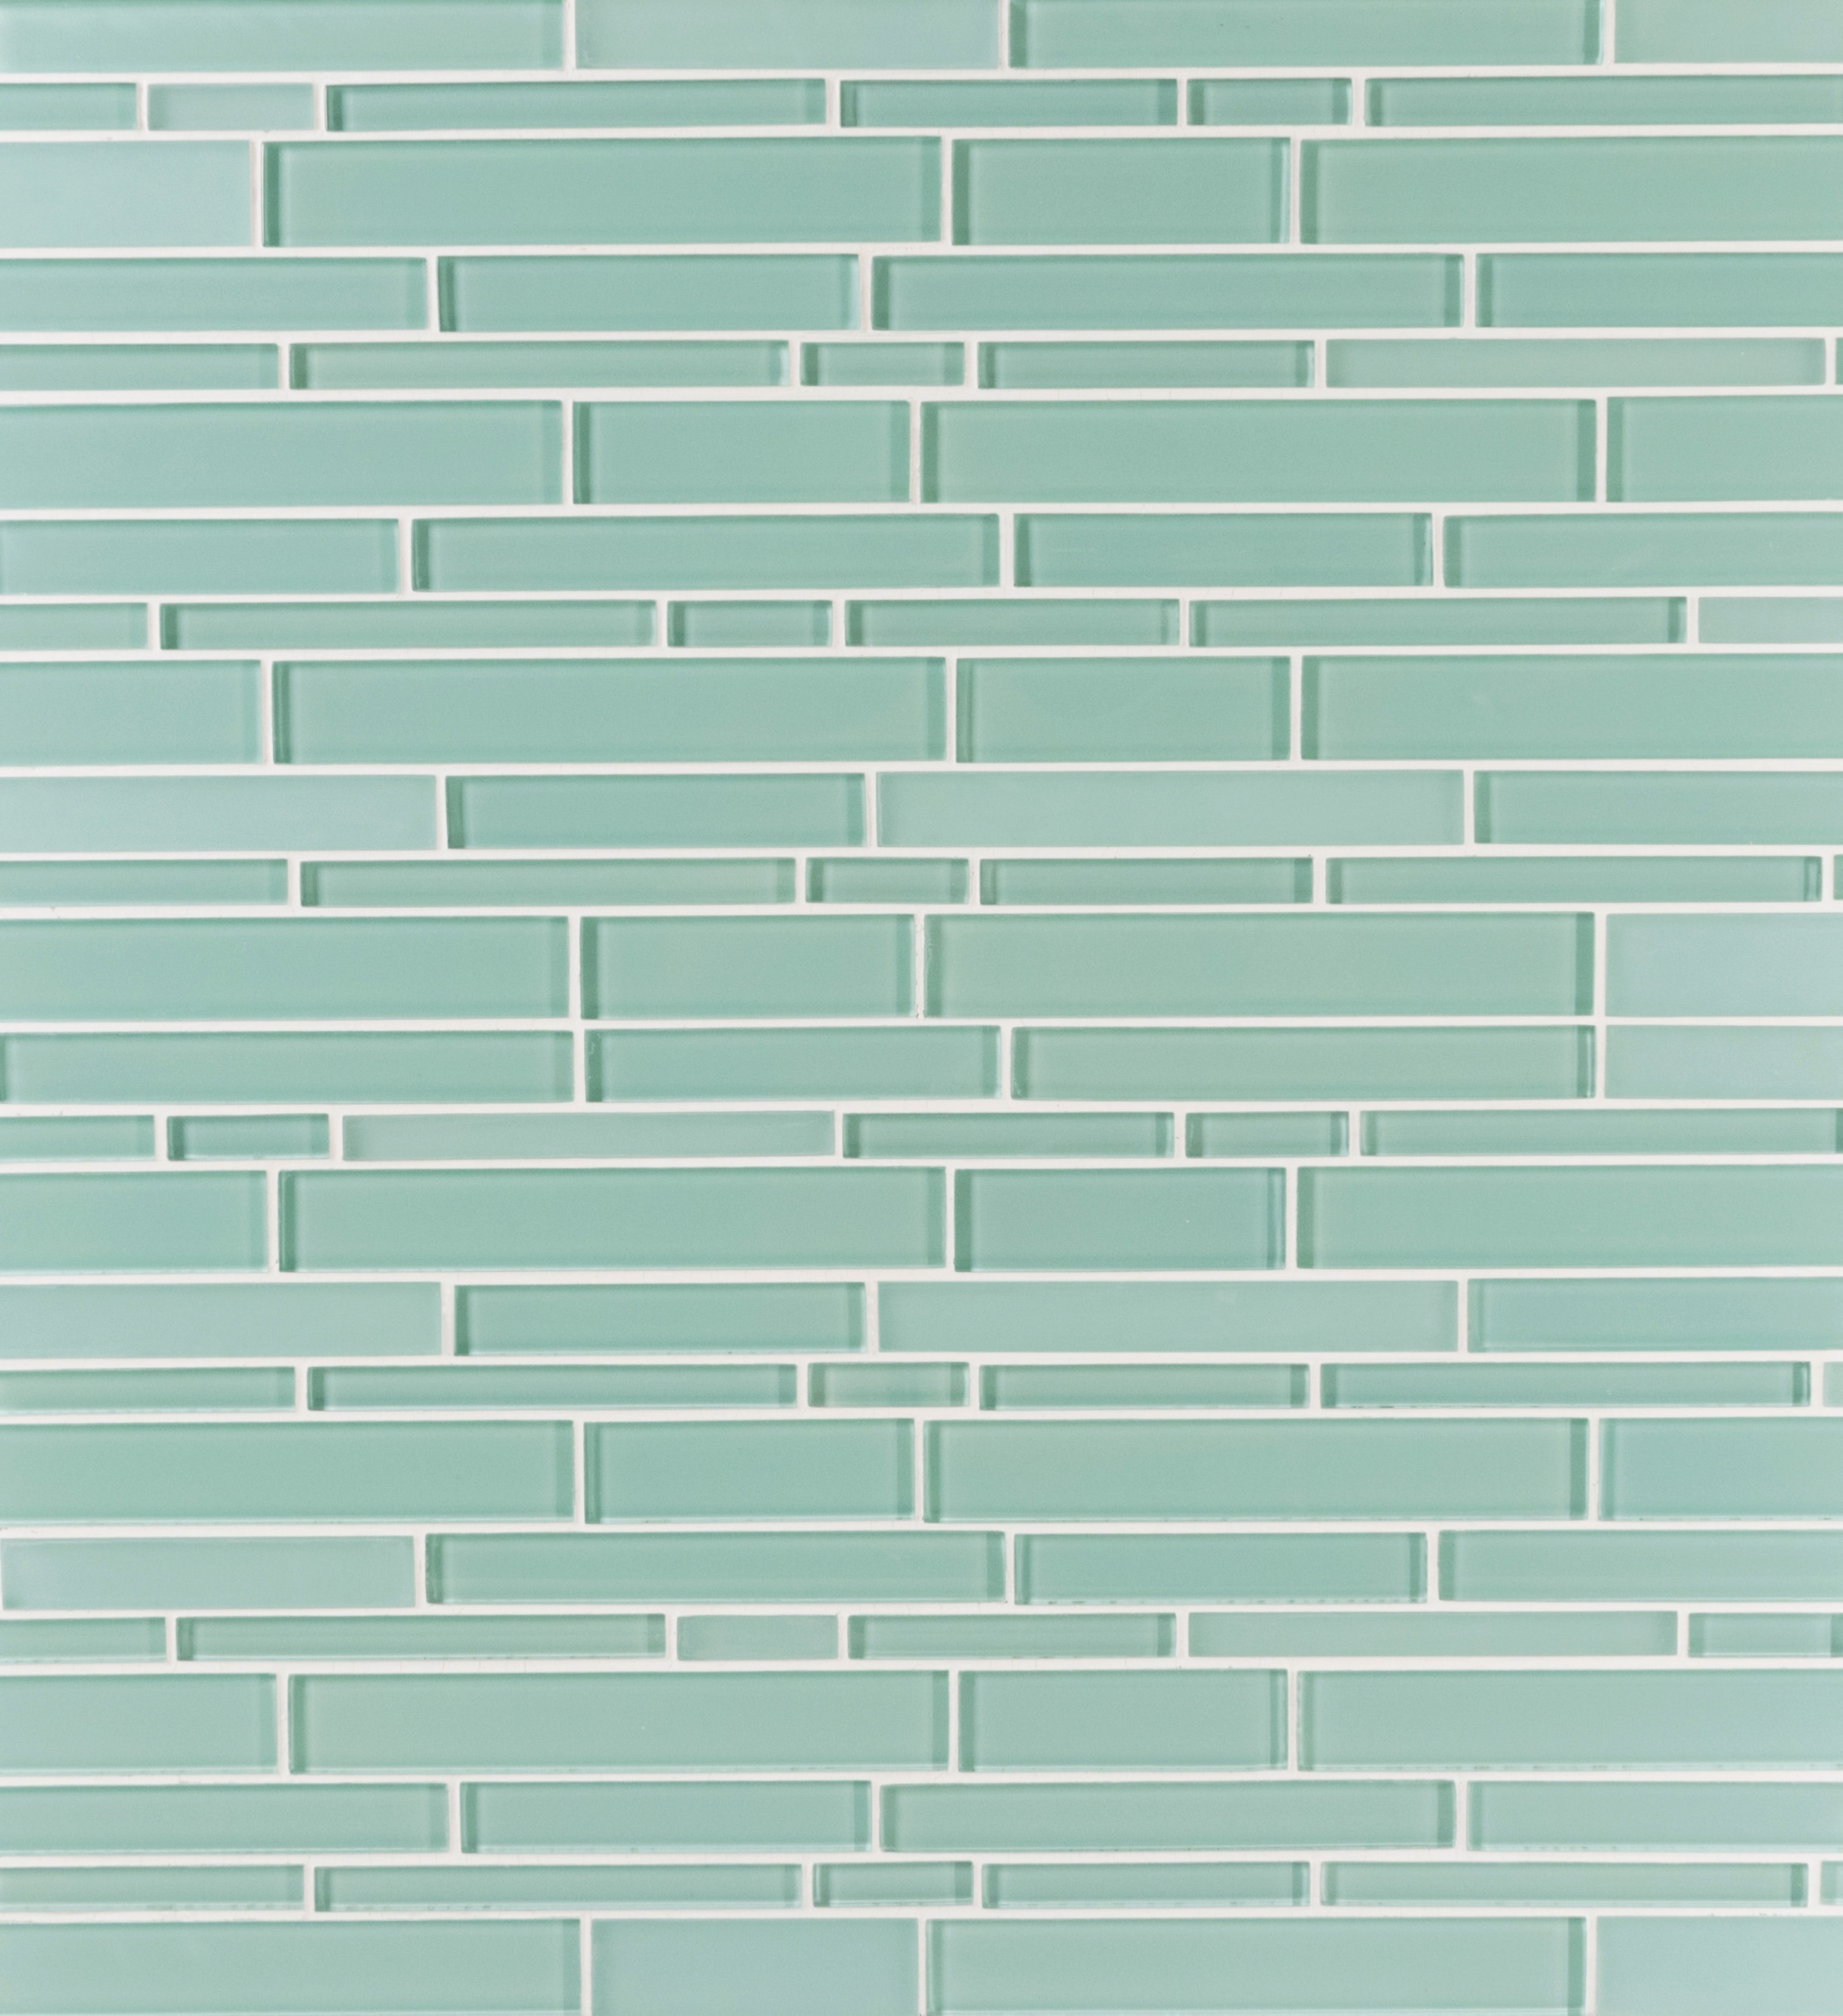 Glass Mosaic / 14 x 12 x 0.31 inches / Glossy Interlocking Random Sized Glass Mosaic Tile In Light Teal 0